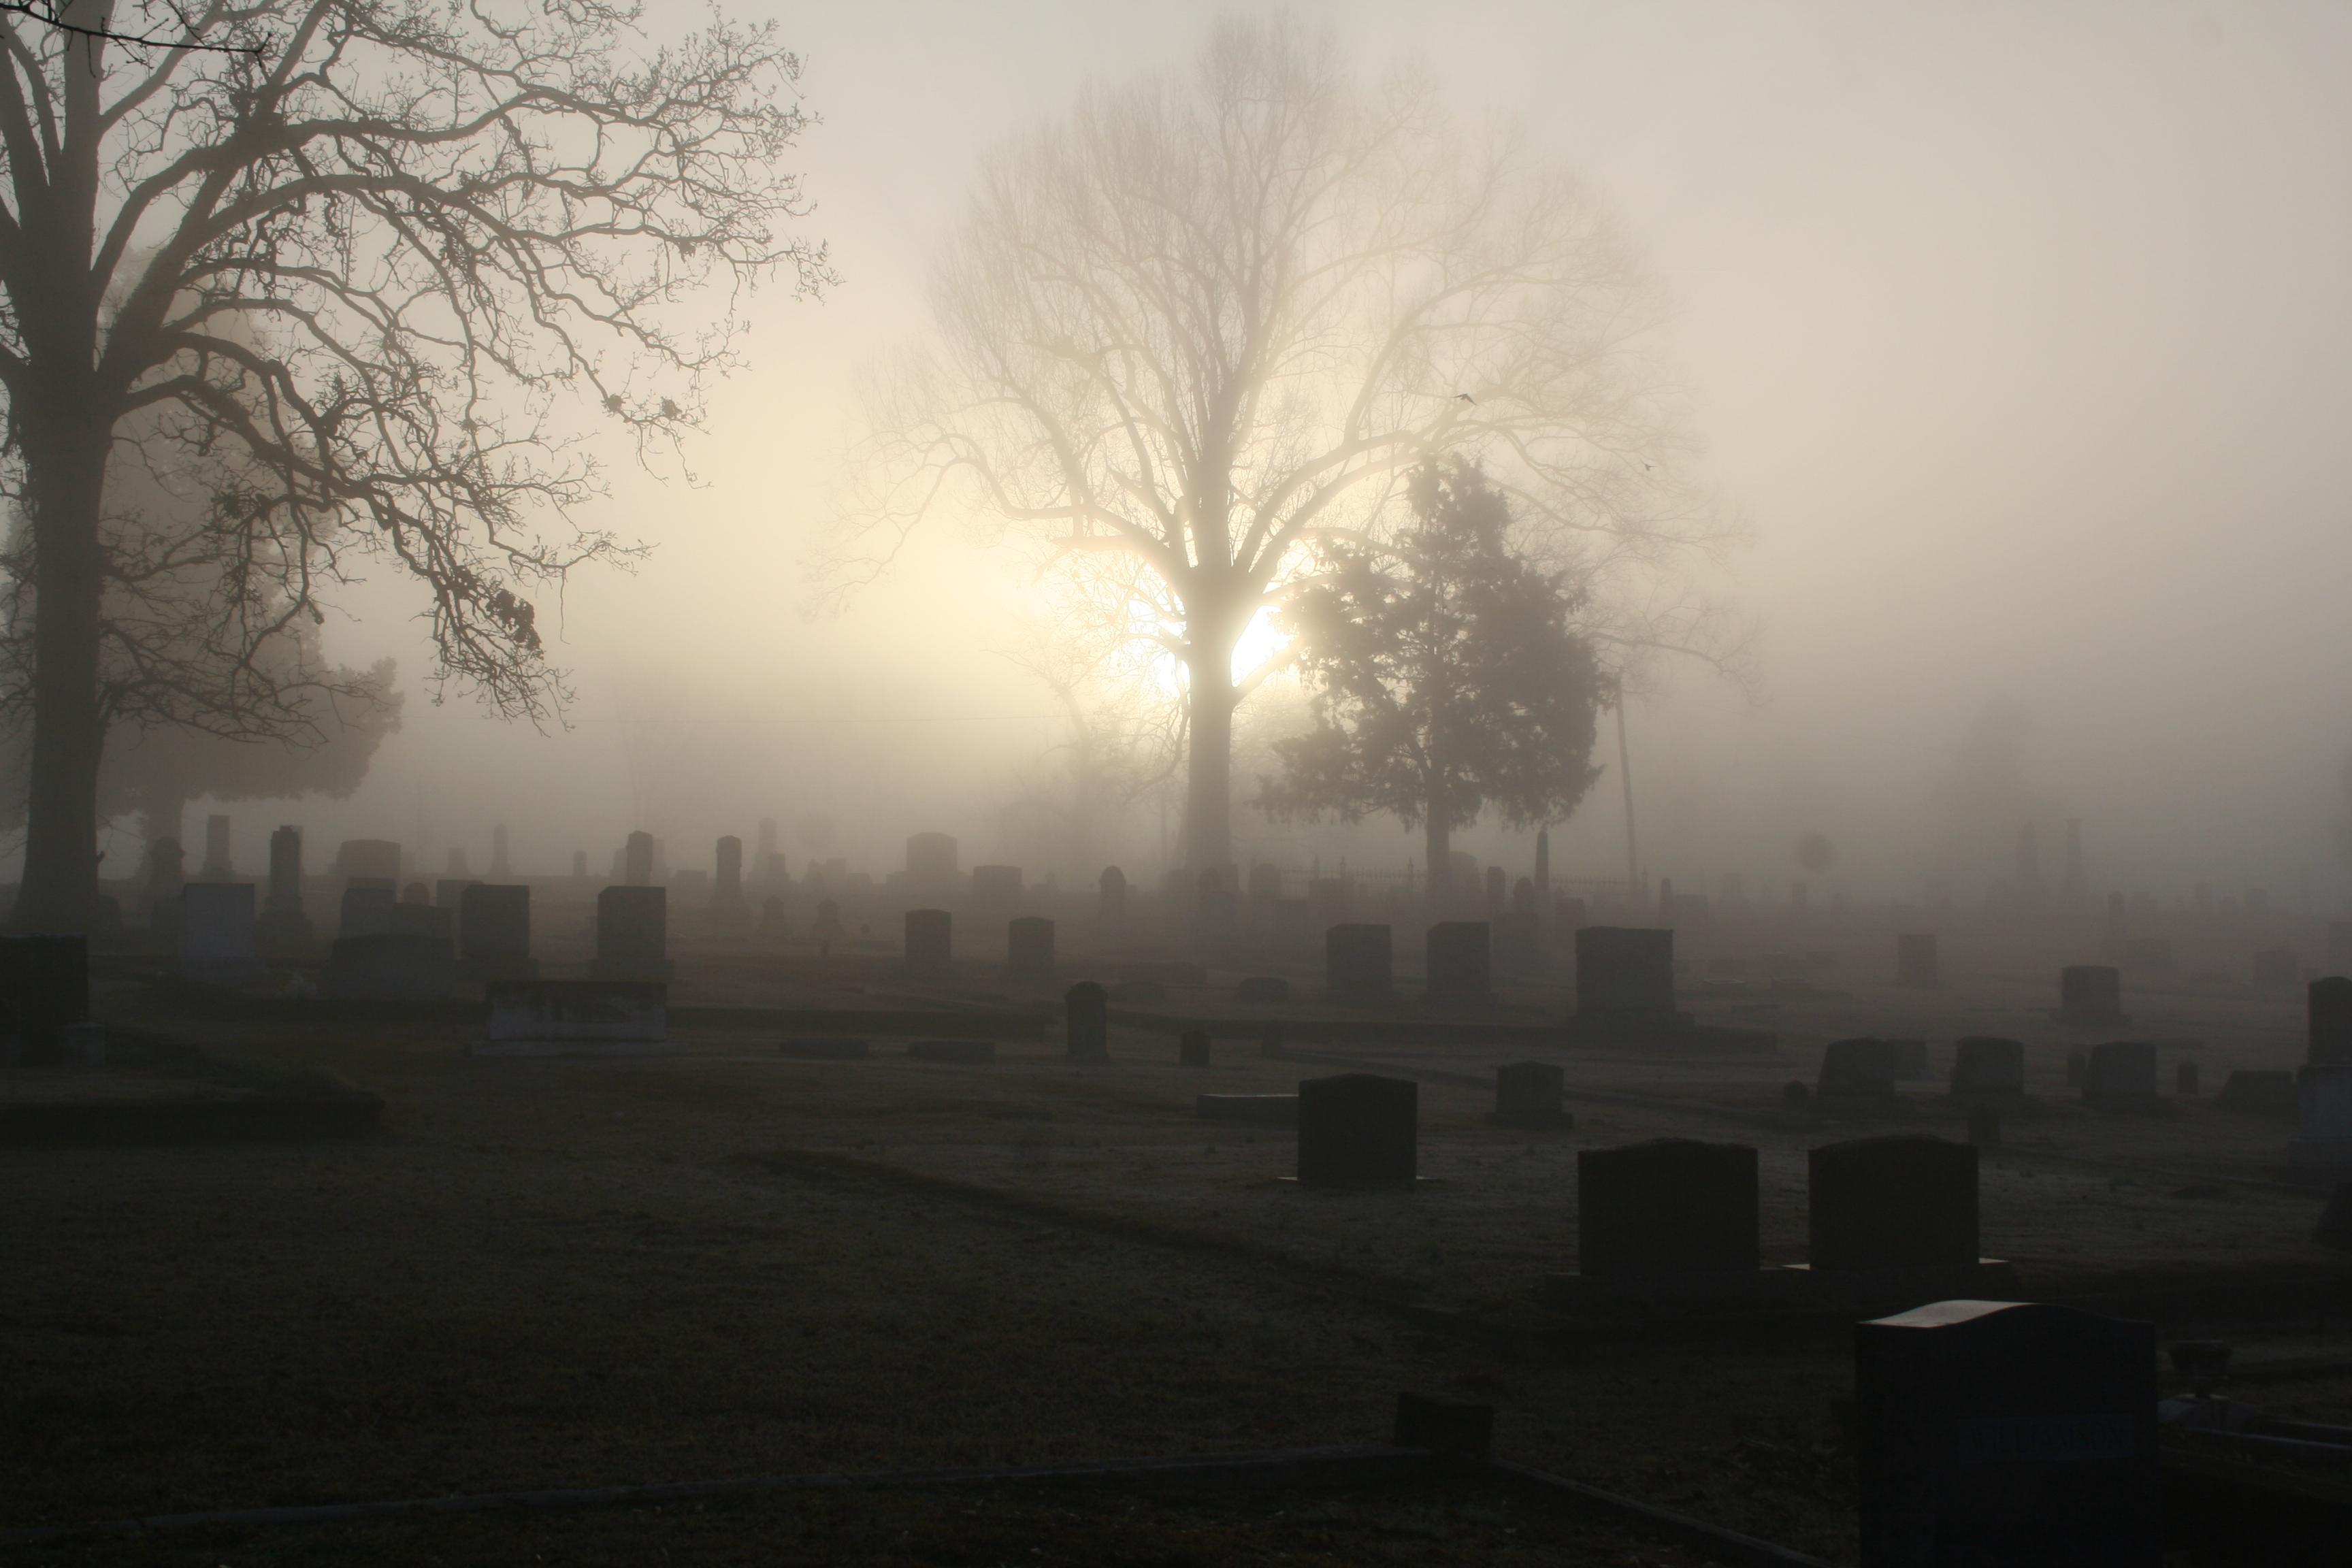 Wallpaper Atmospheric Calm Calming Cemetery Dawn Eerie Eery Fellows Fog Foggy Grave Graves Graveyard Headstone Headstones Lenstagged